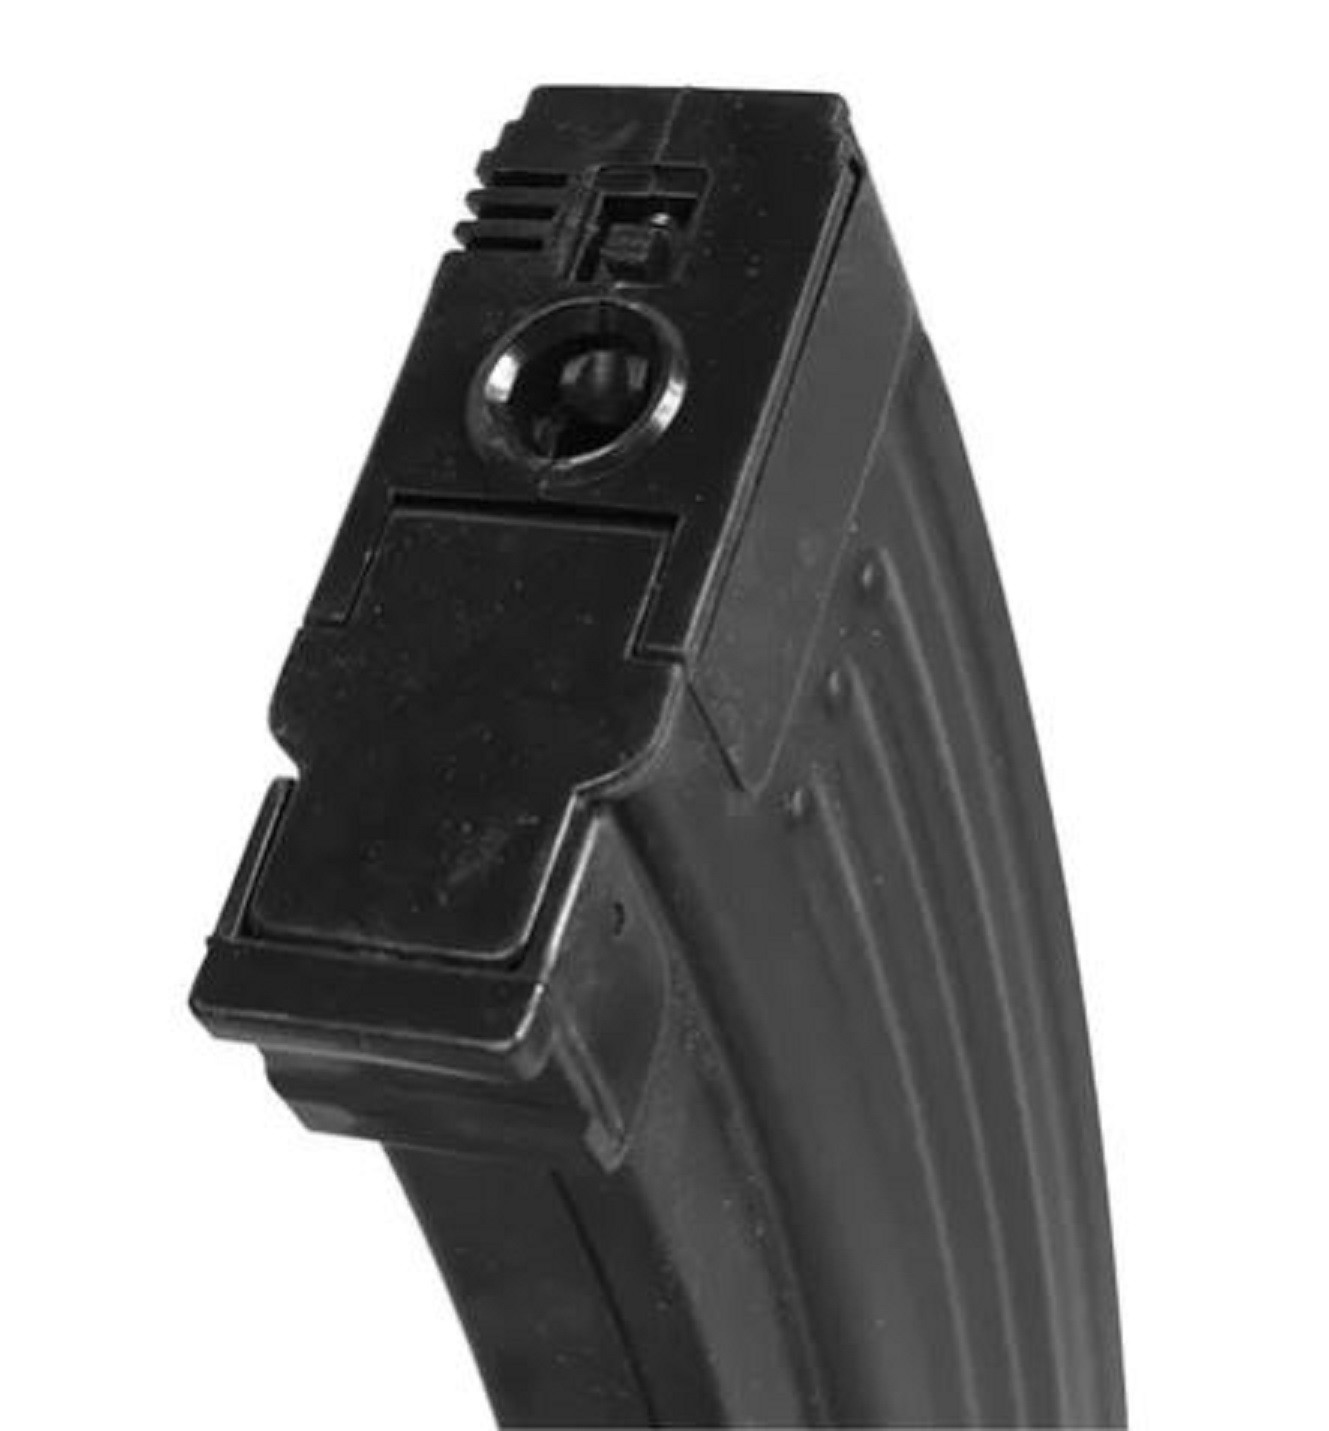 Magazine Hi-cap Airsoft Cyma 600 Bb's Ak-47 Full Metal